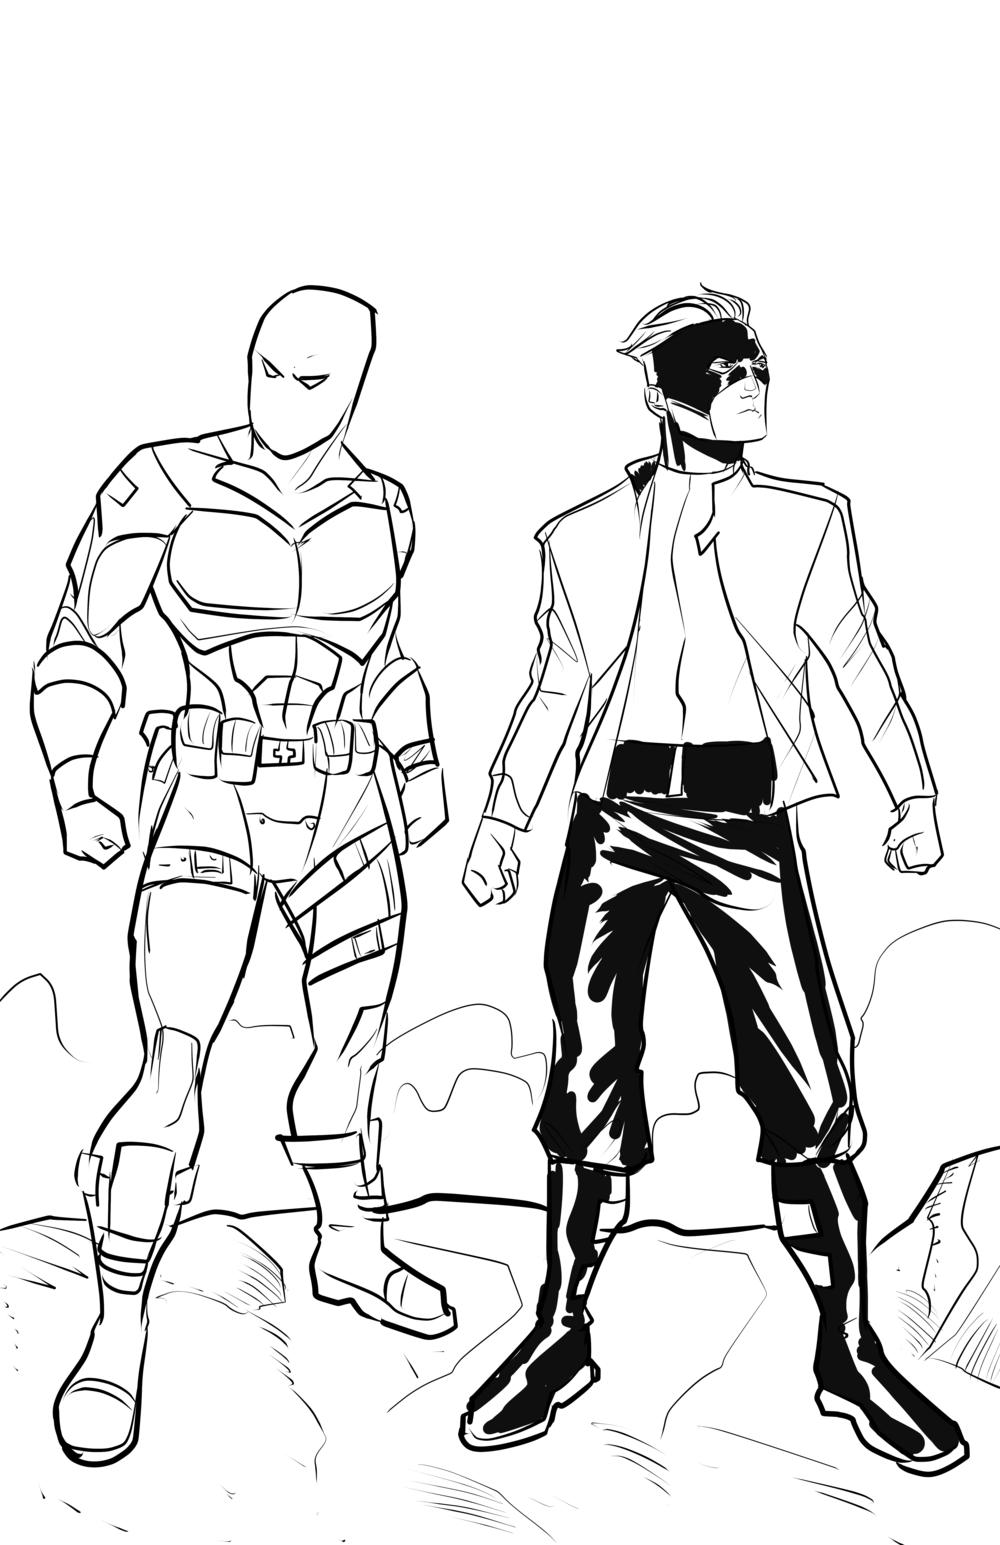 Art by: Joe Eisma   Characters Copyright: Slamfist Media